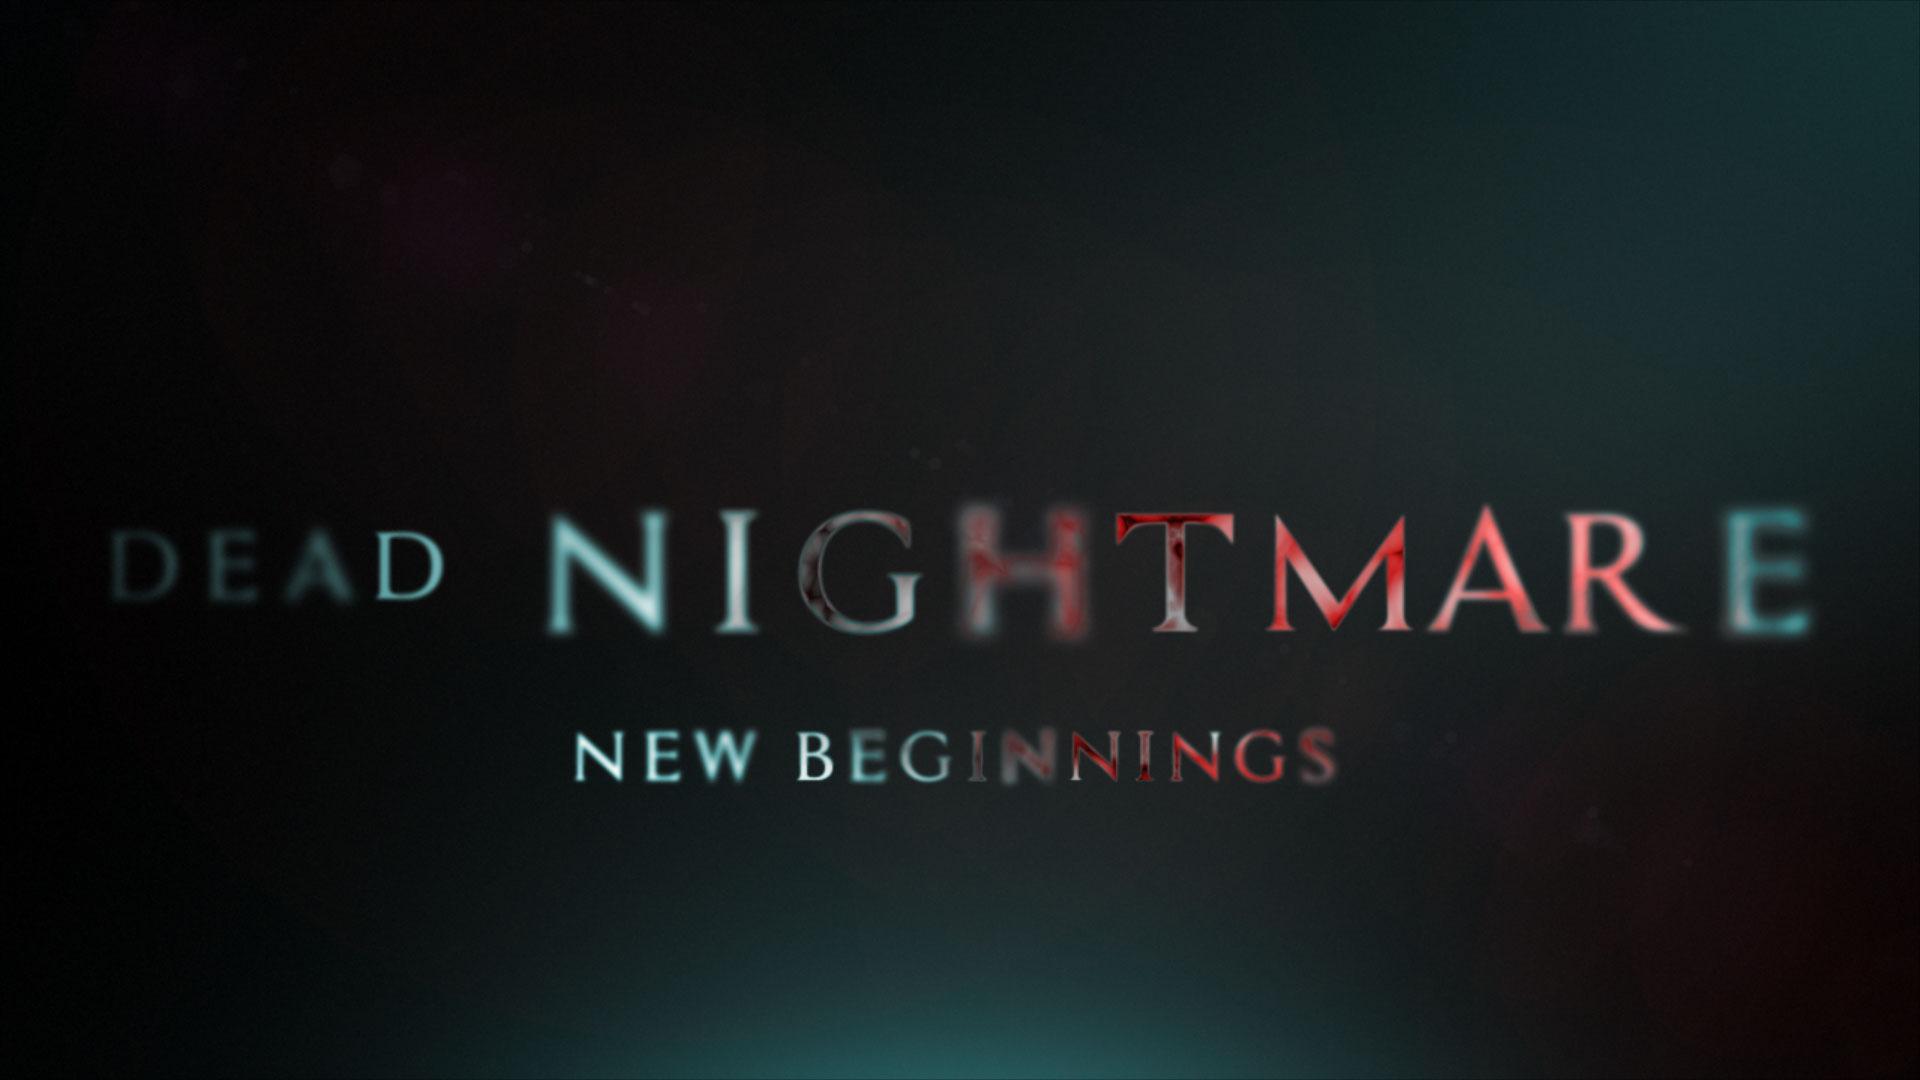 Dead Nightmare New Beginnings Picture 2017_01472